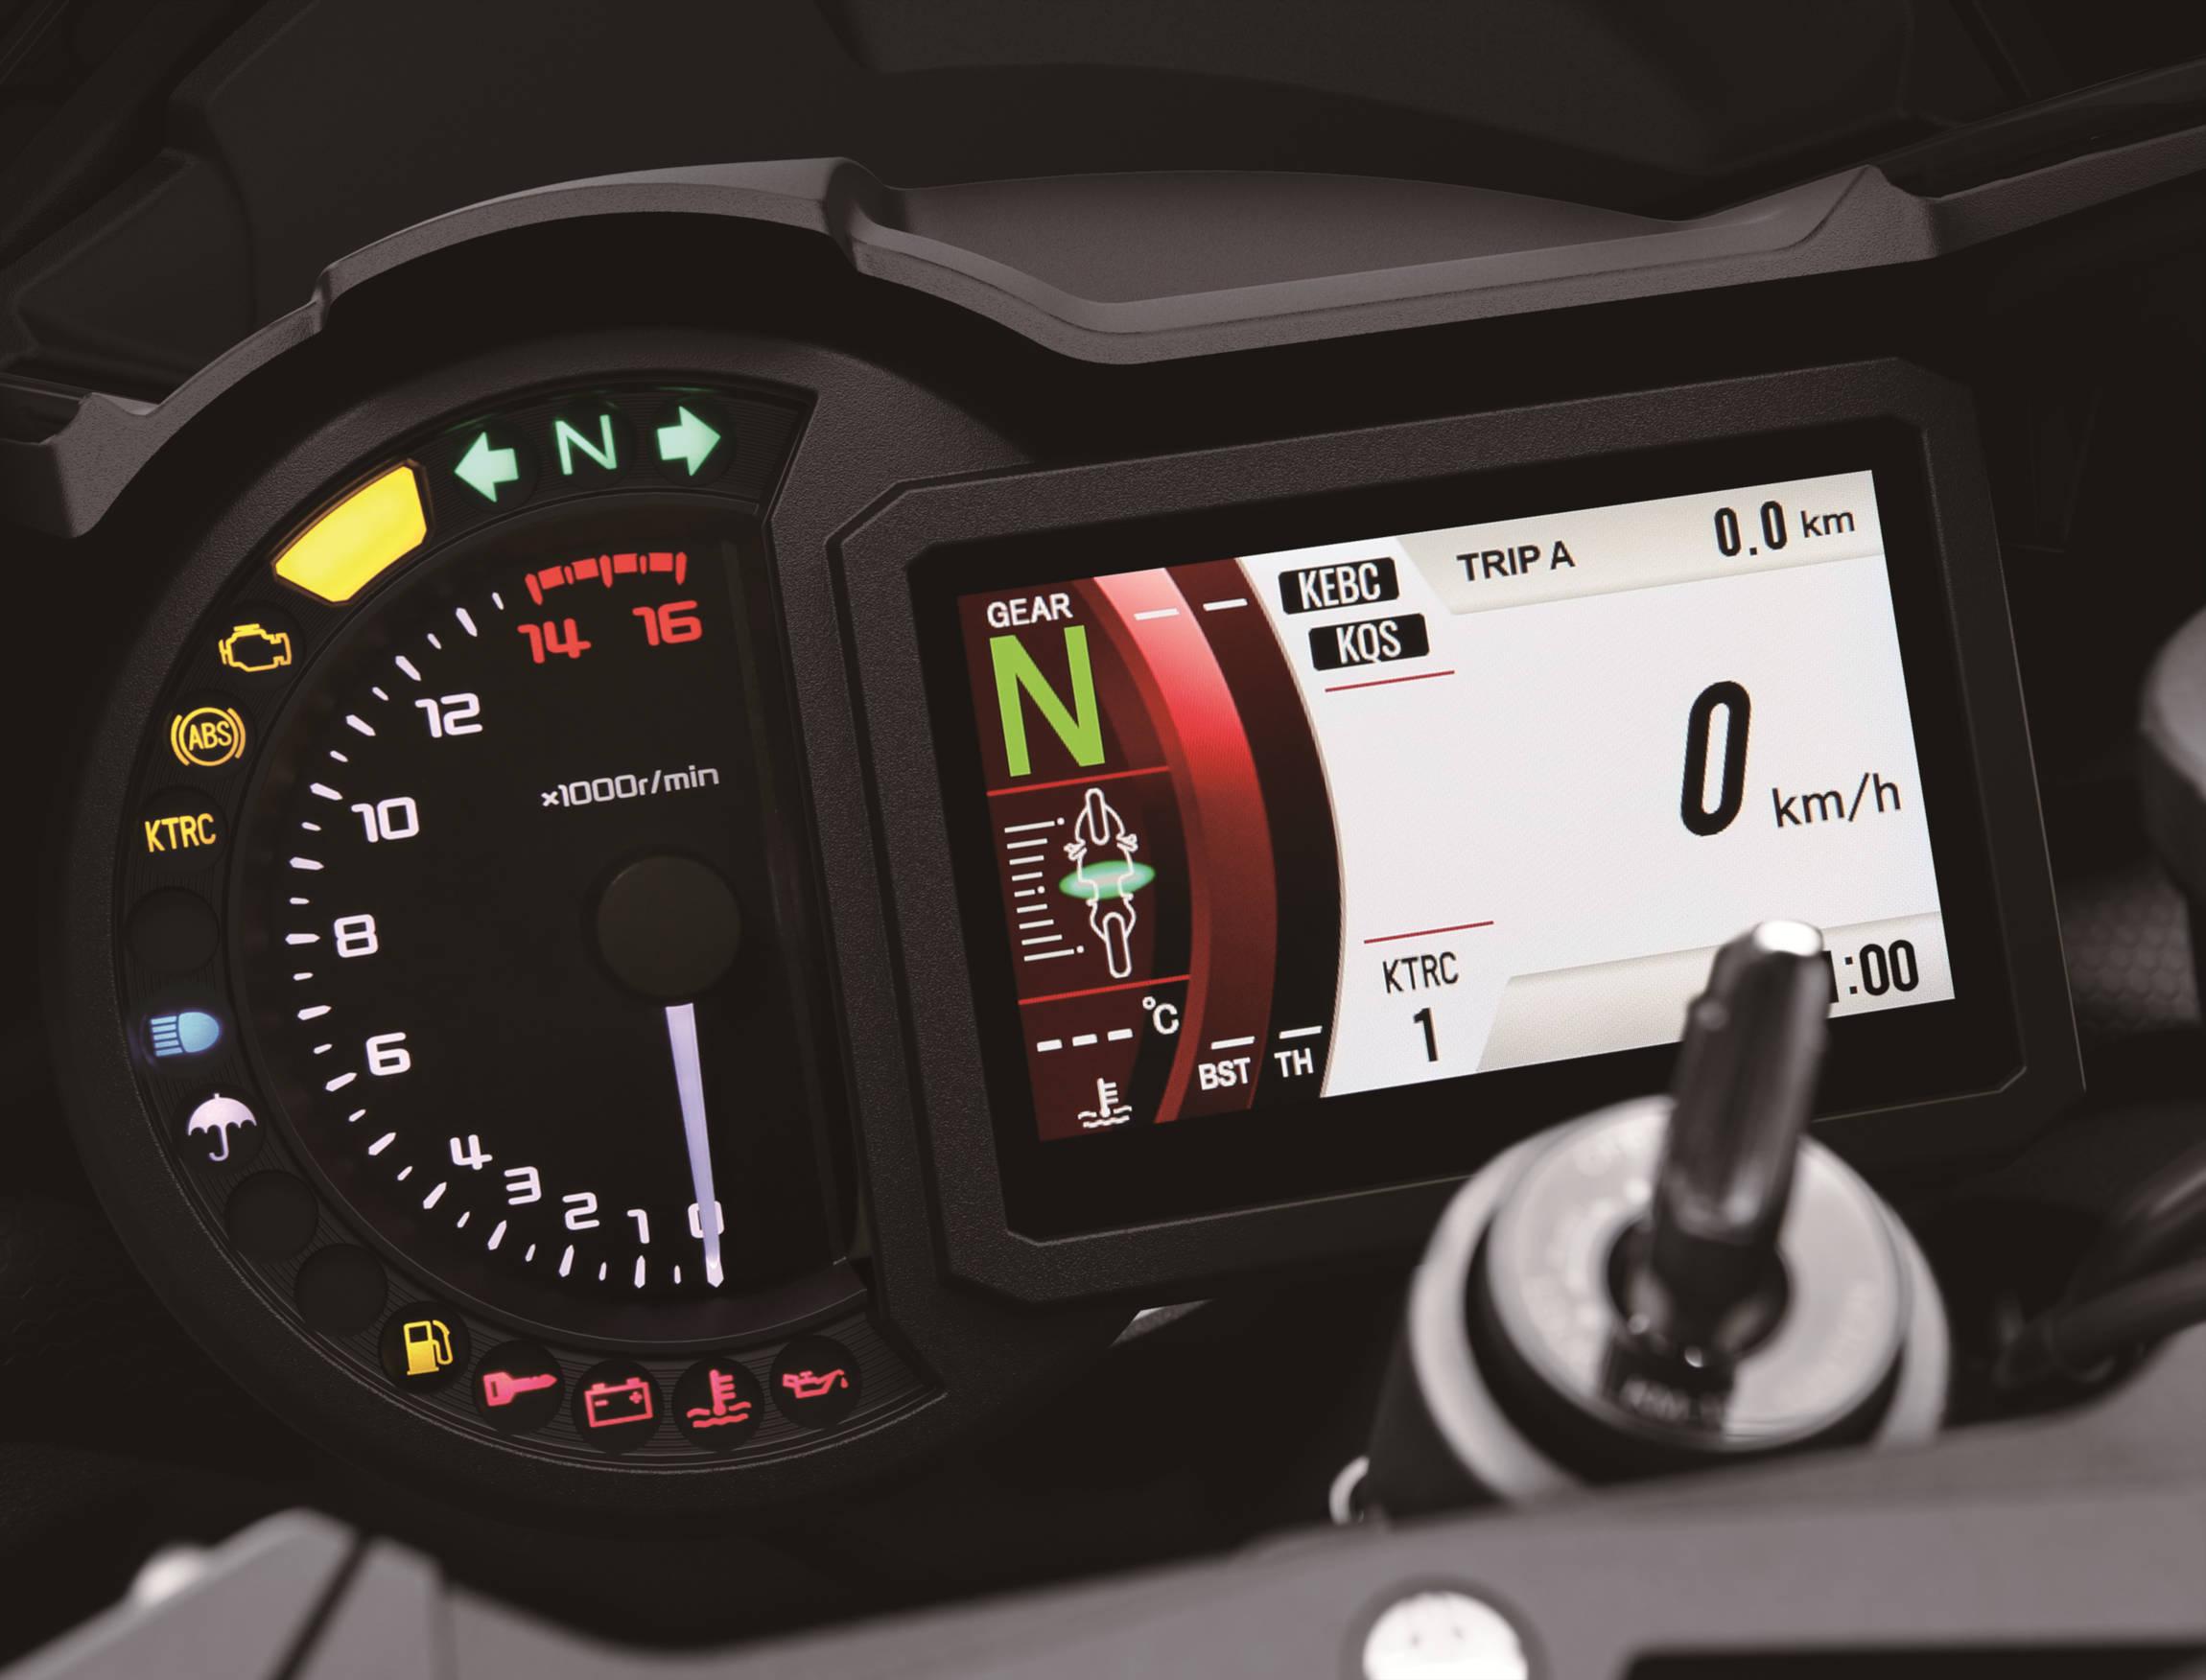 Kawasaki Announces Changes to 2019 Ninja H2, H2 Carbon and H2R